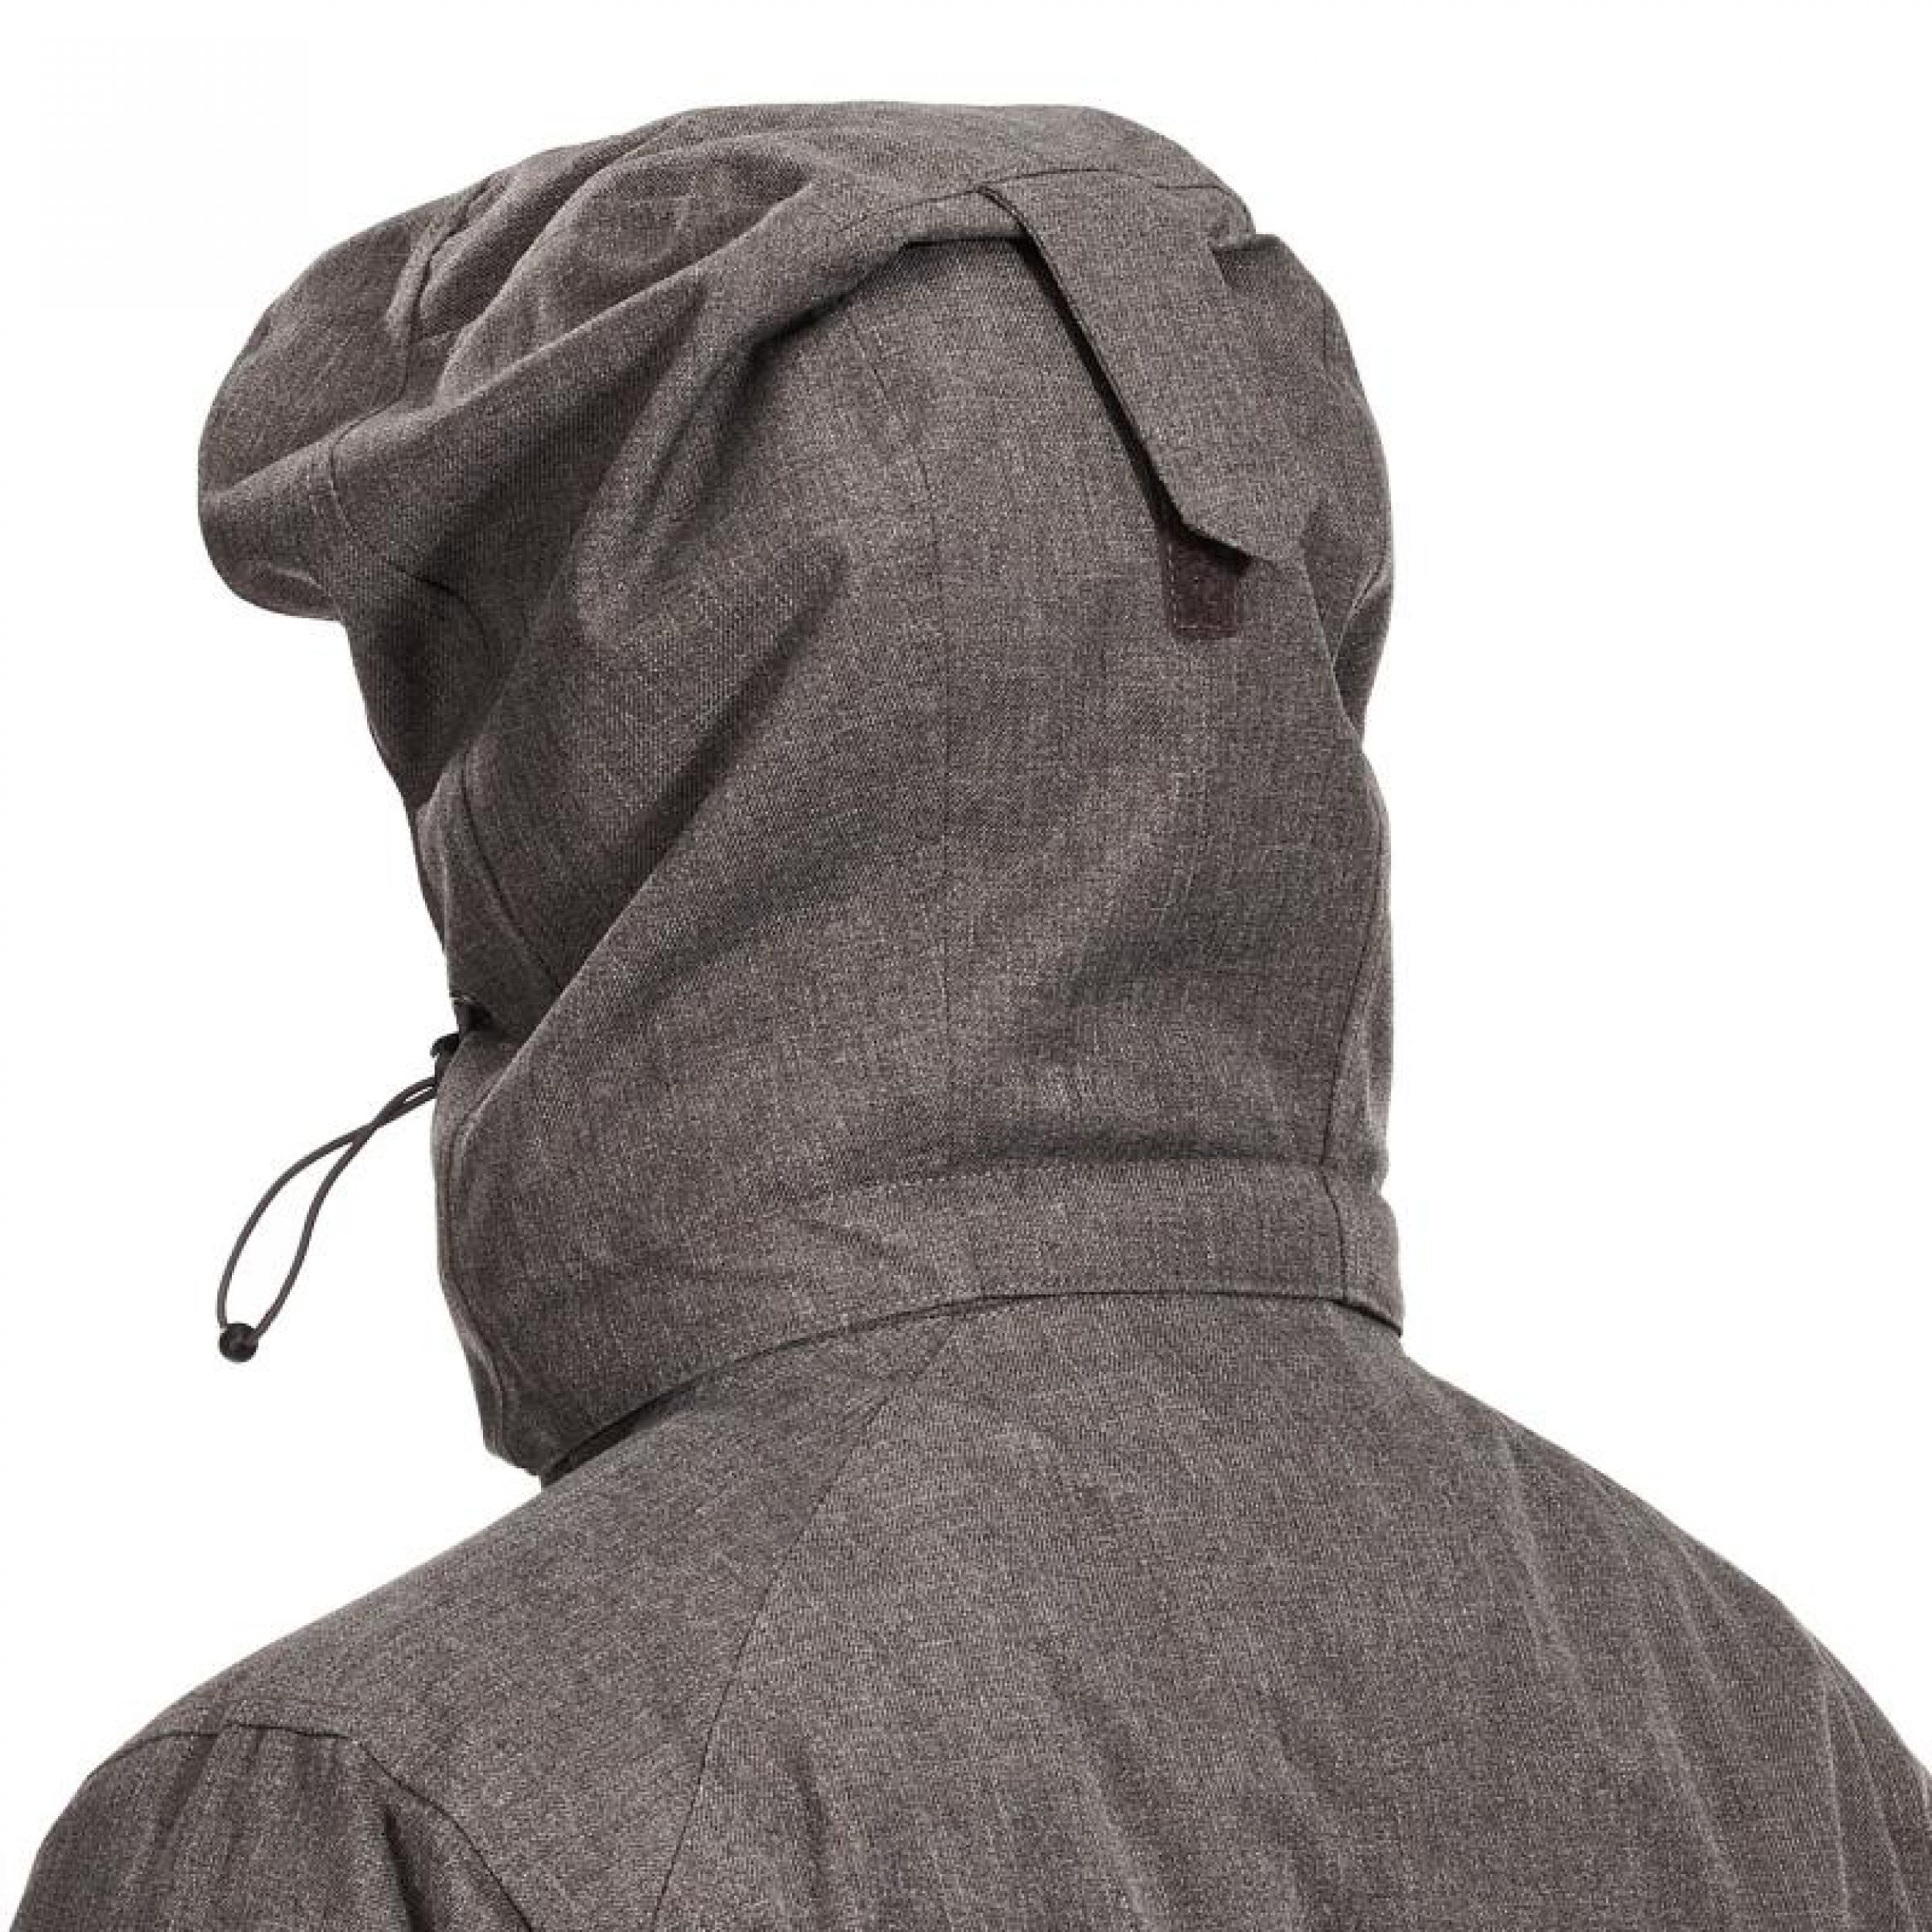 279686004_q_3in1_jacket_shenandoa_schoeffel.jpg